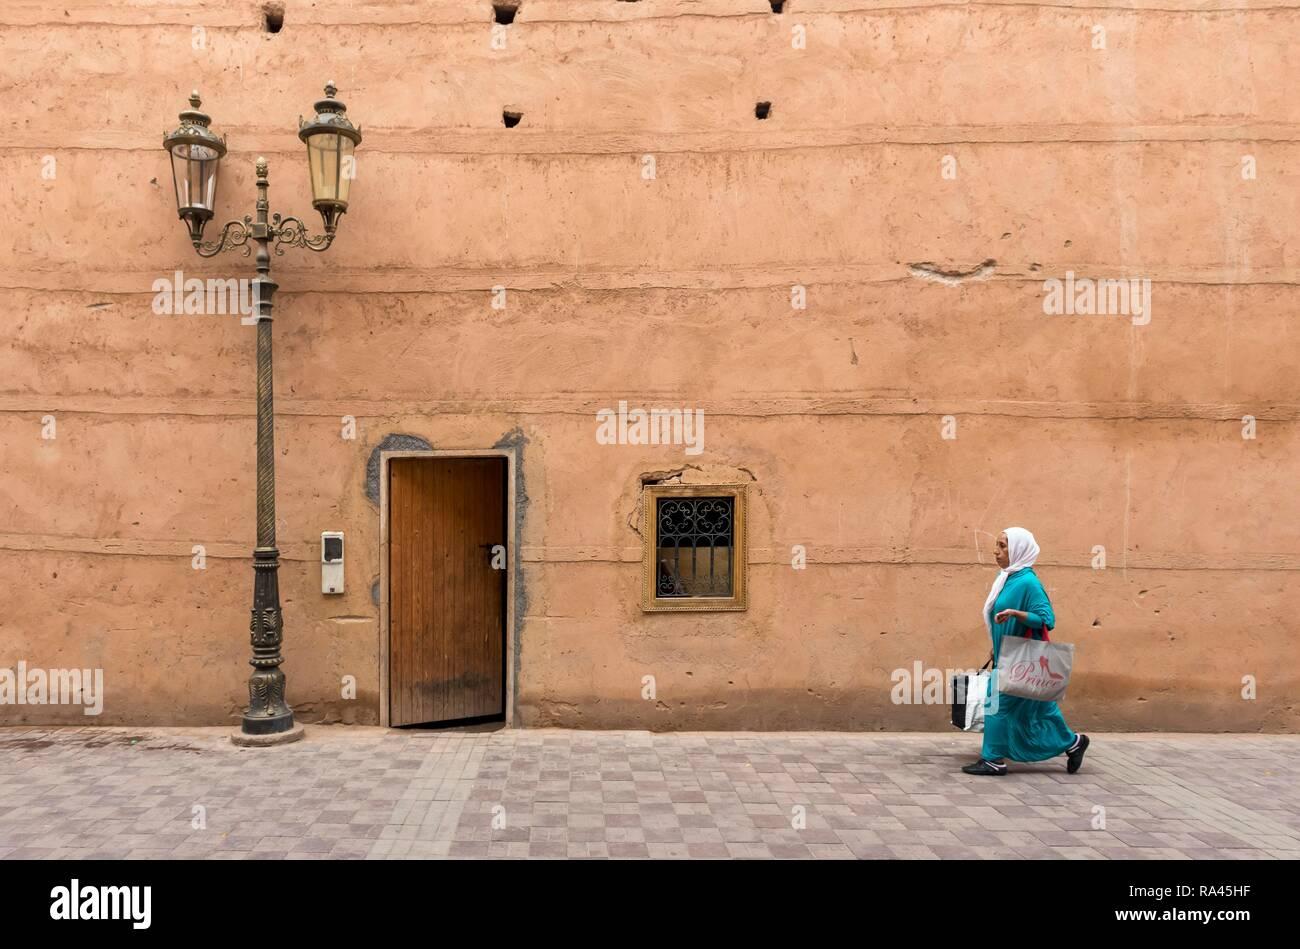 Woman walks along clay walls of Badi Palace in Marrakech, Morocco Stock Photo